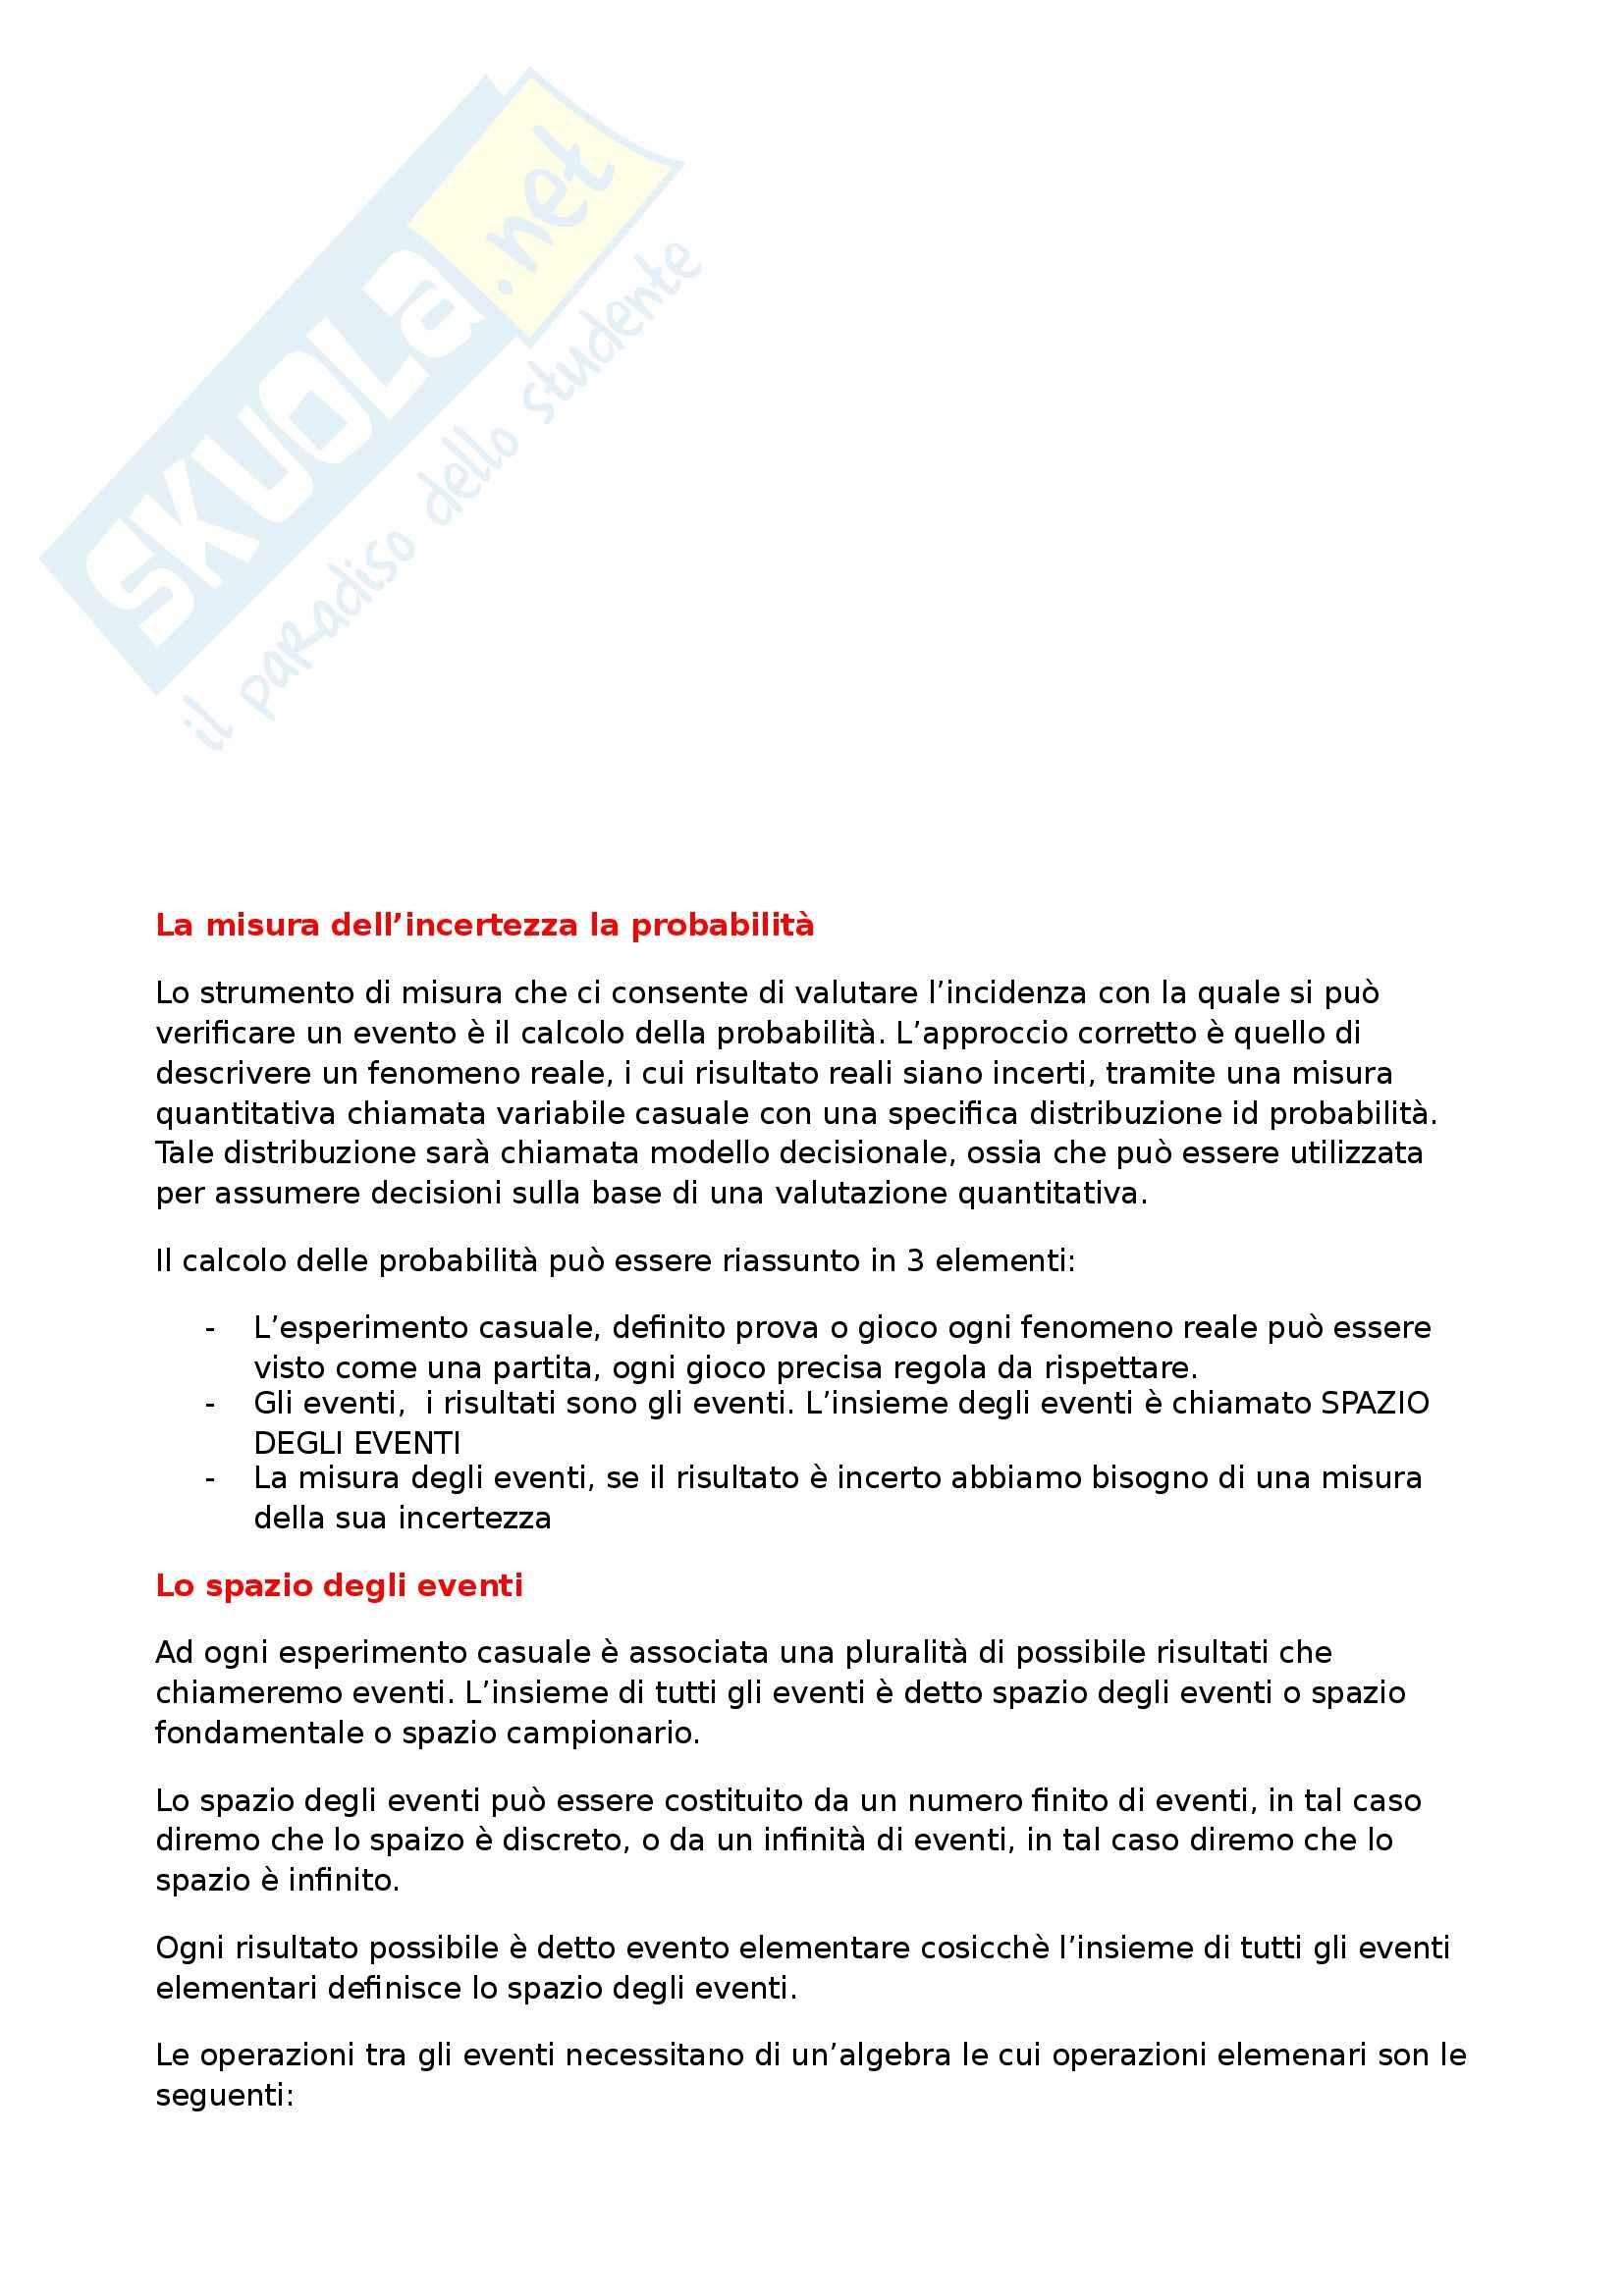 Riassunto esame Statistica, prof. Di Battista Pag. 2